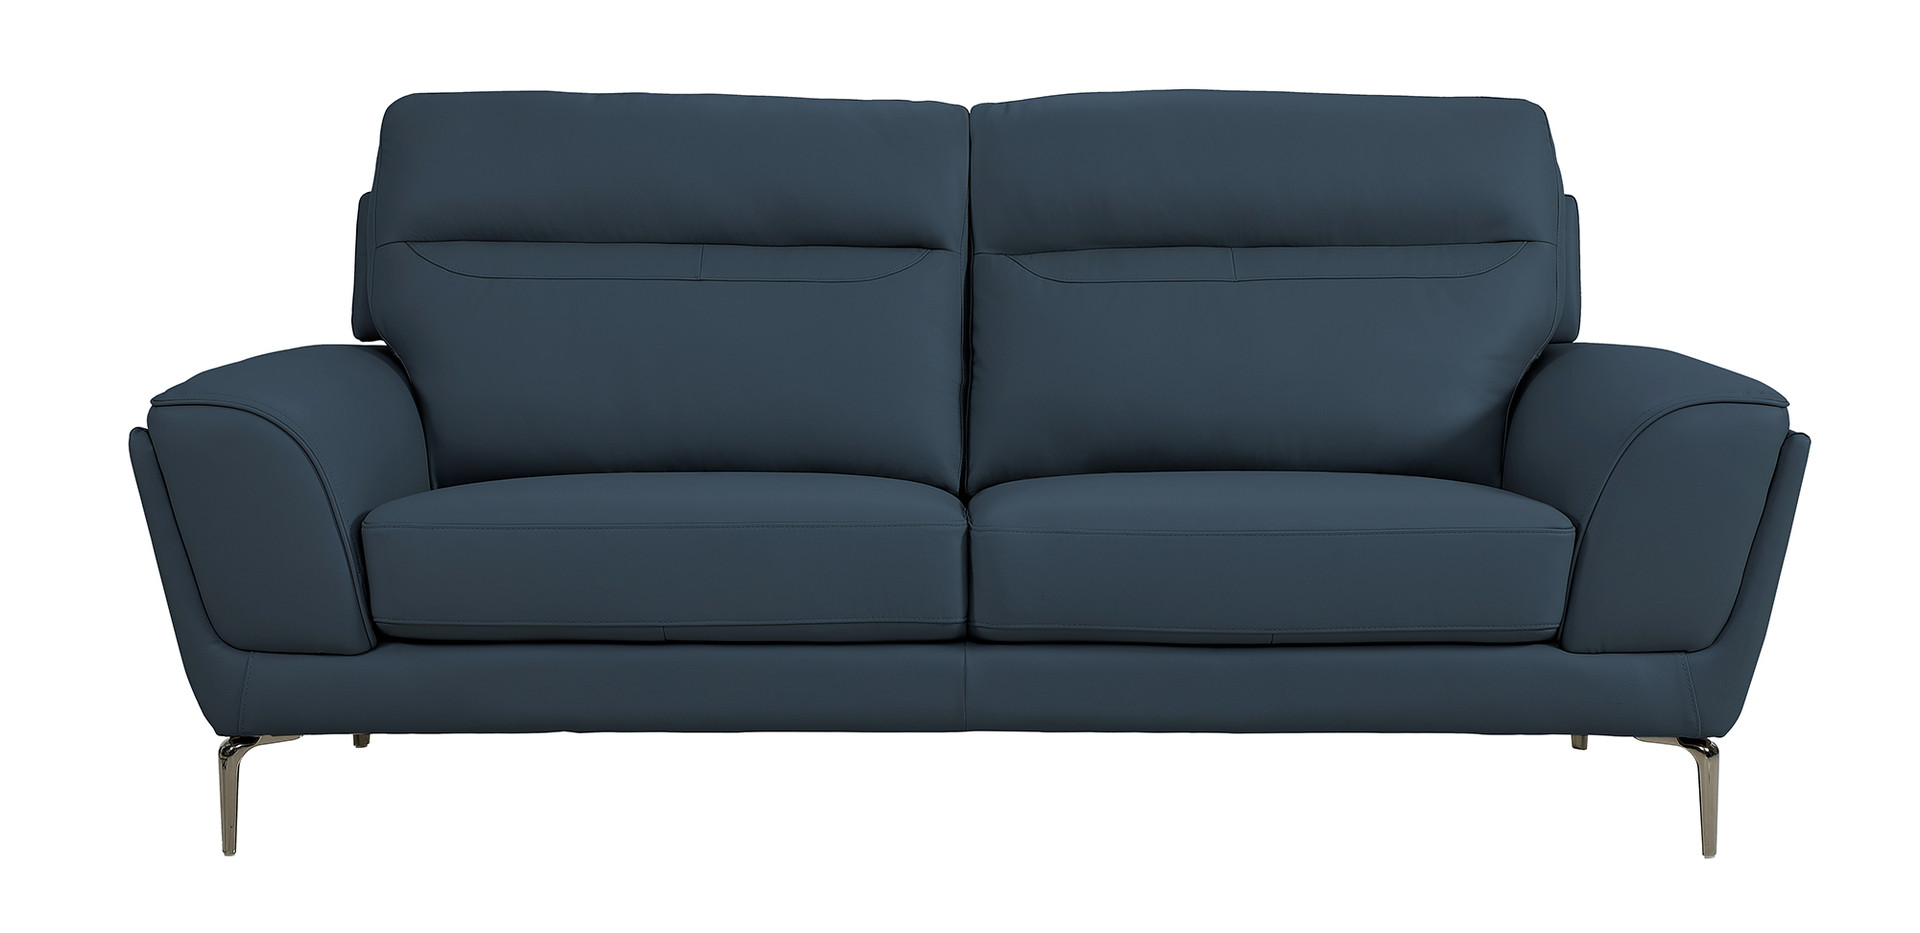 Vitalia 3 Seater -Indigo Blue Straight.j